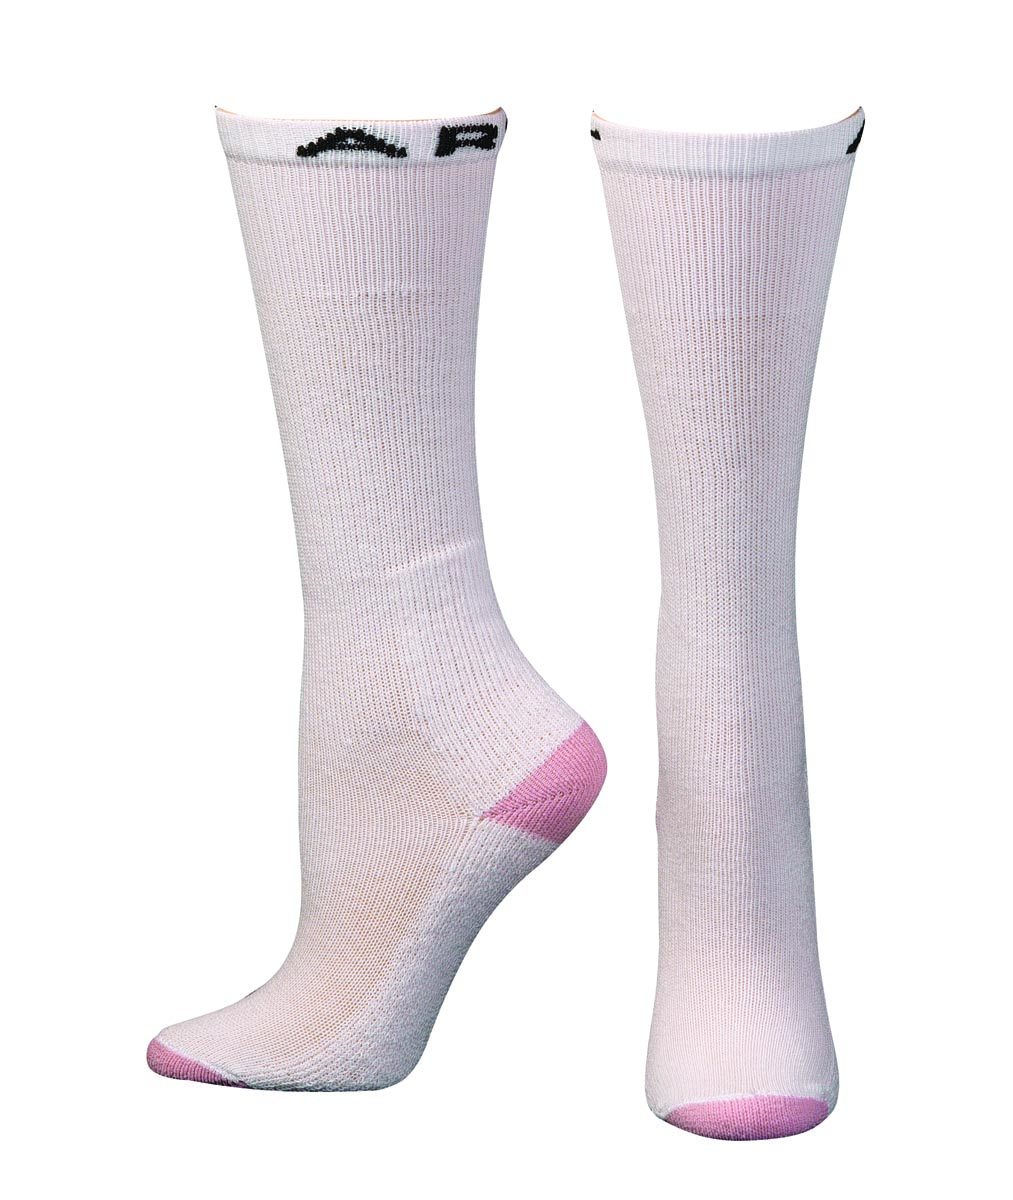 ARIAT Women's OTC Comfort Sock, 3 Pack